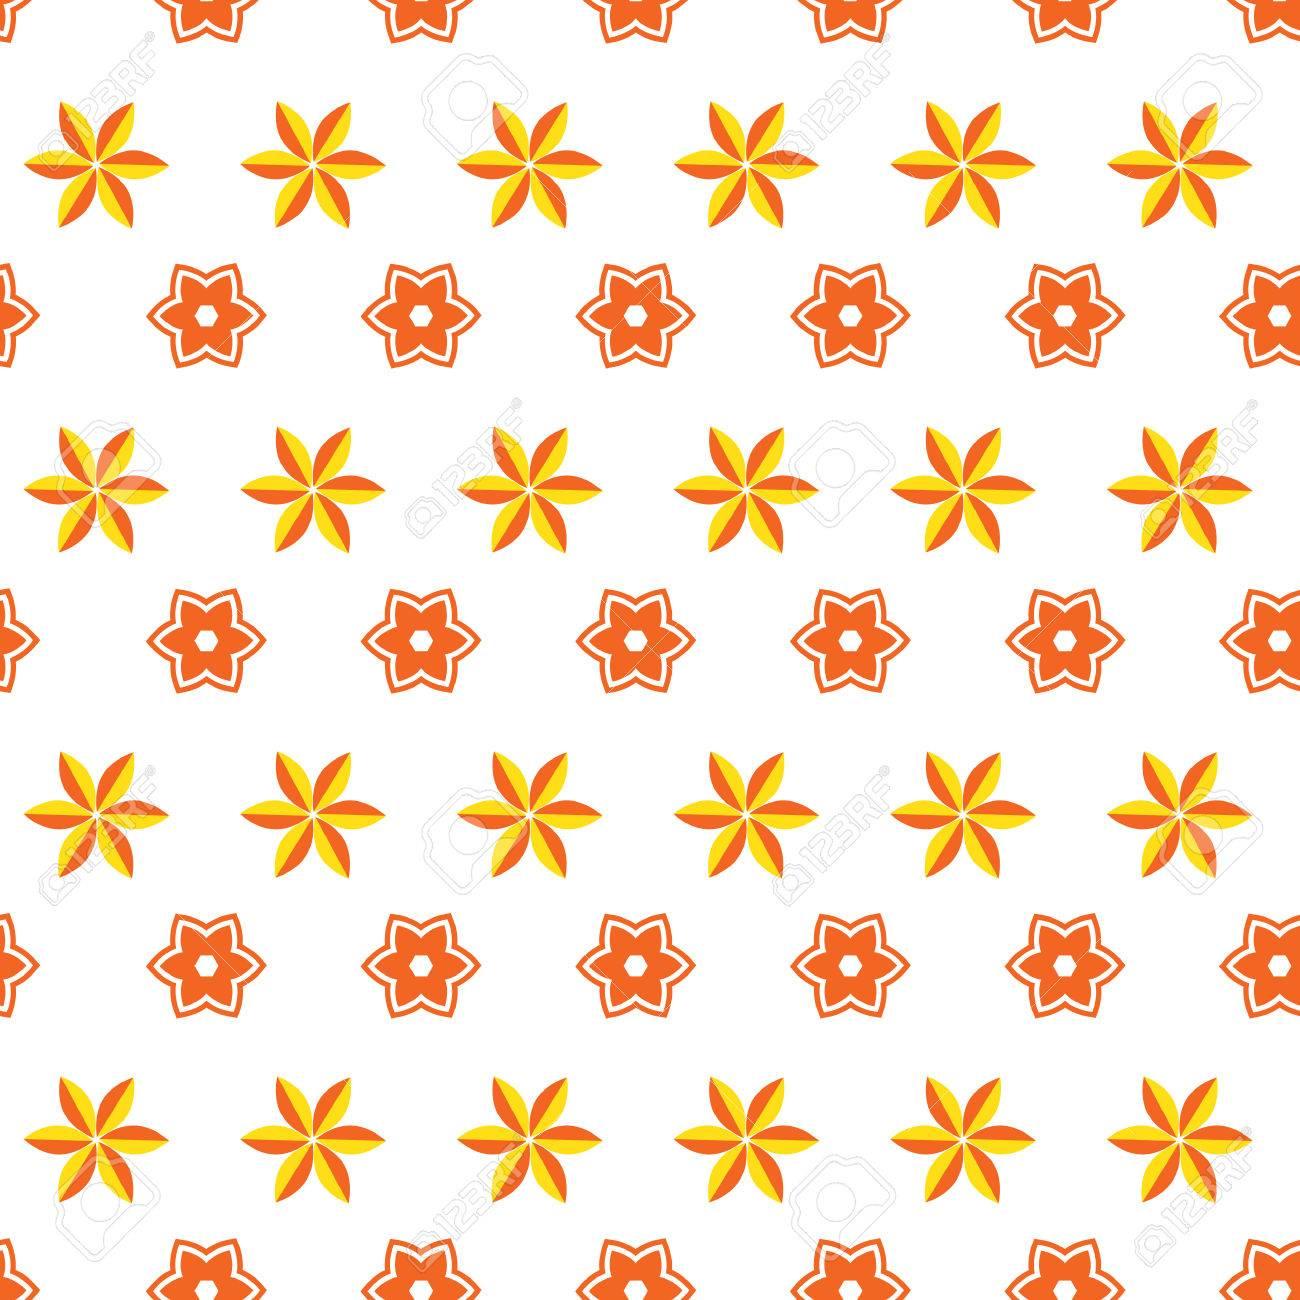 48322305 orange luxury background art deco for background wallpaper scrapbooking prints